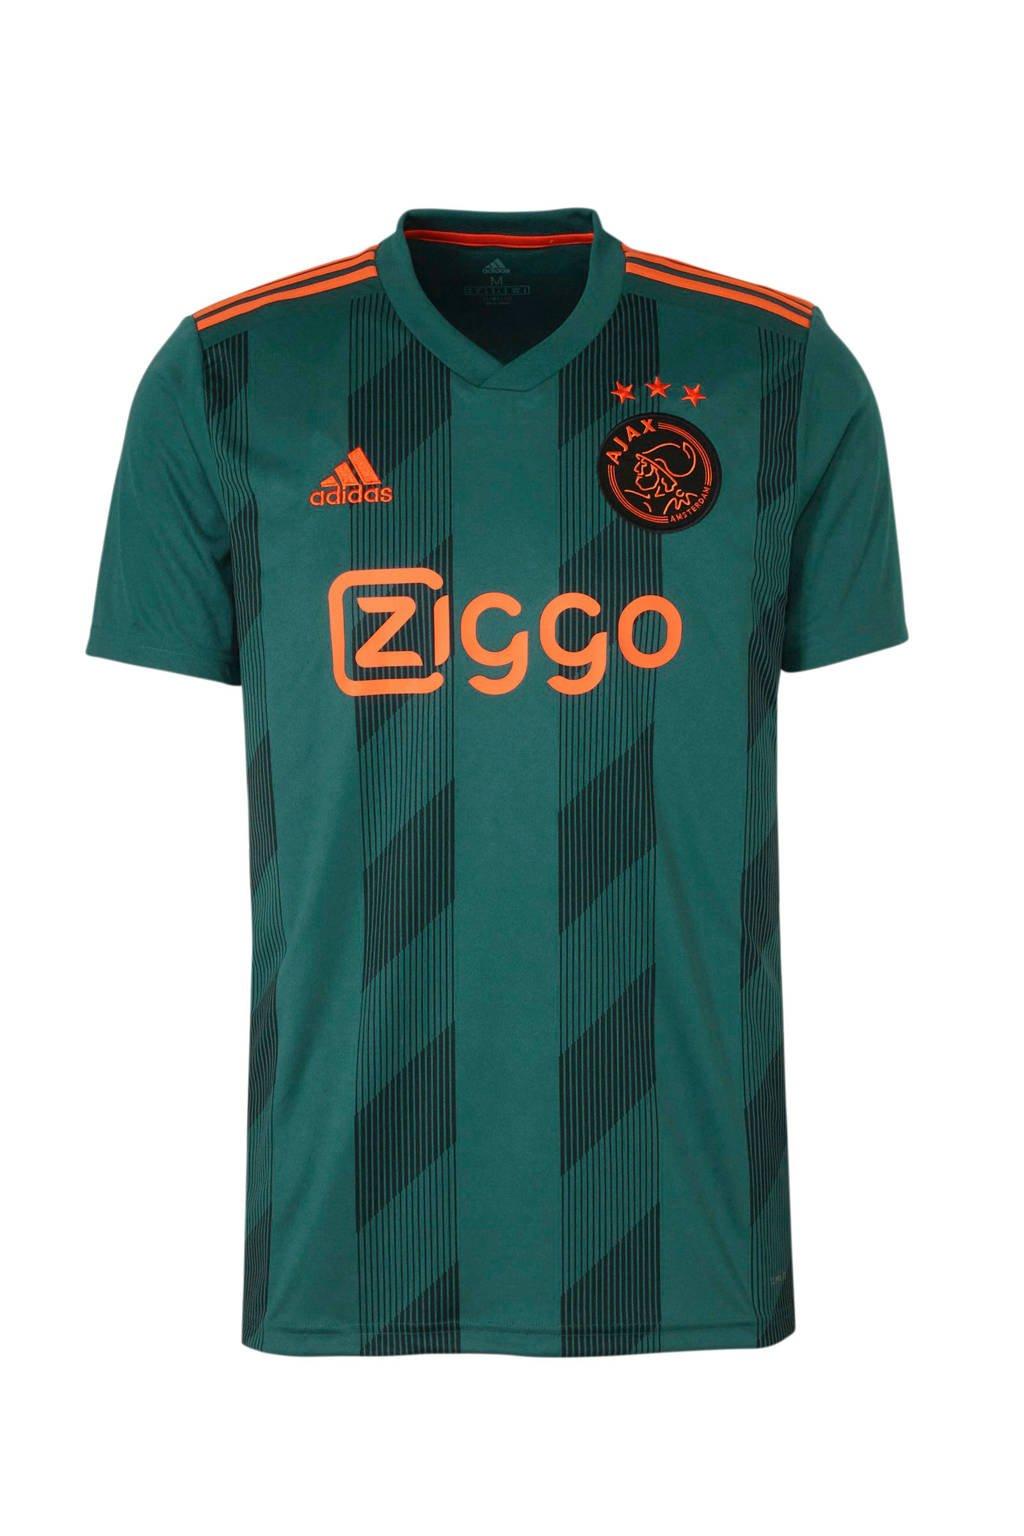 adidas Senior Ajax voetbalshirt Uit, Heren, Groen/zwart/oranje